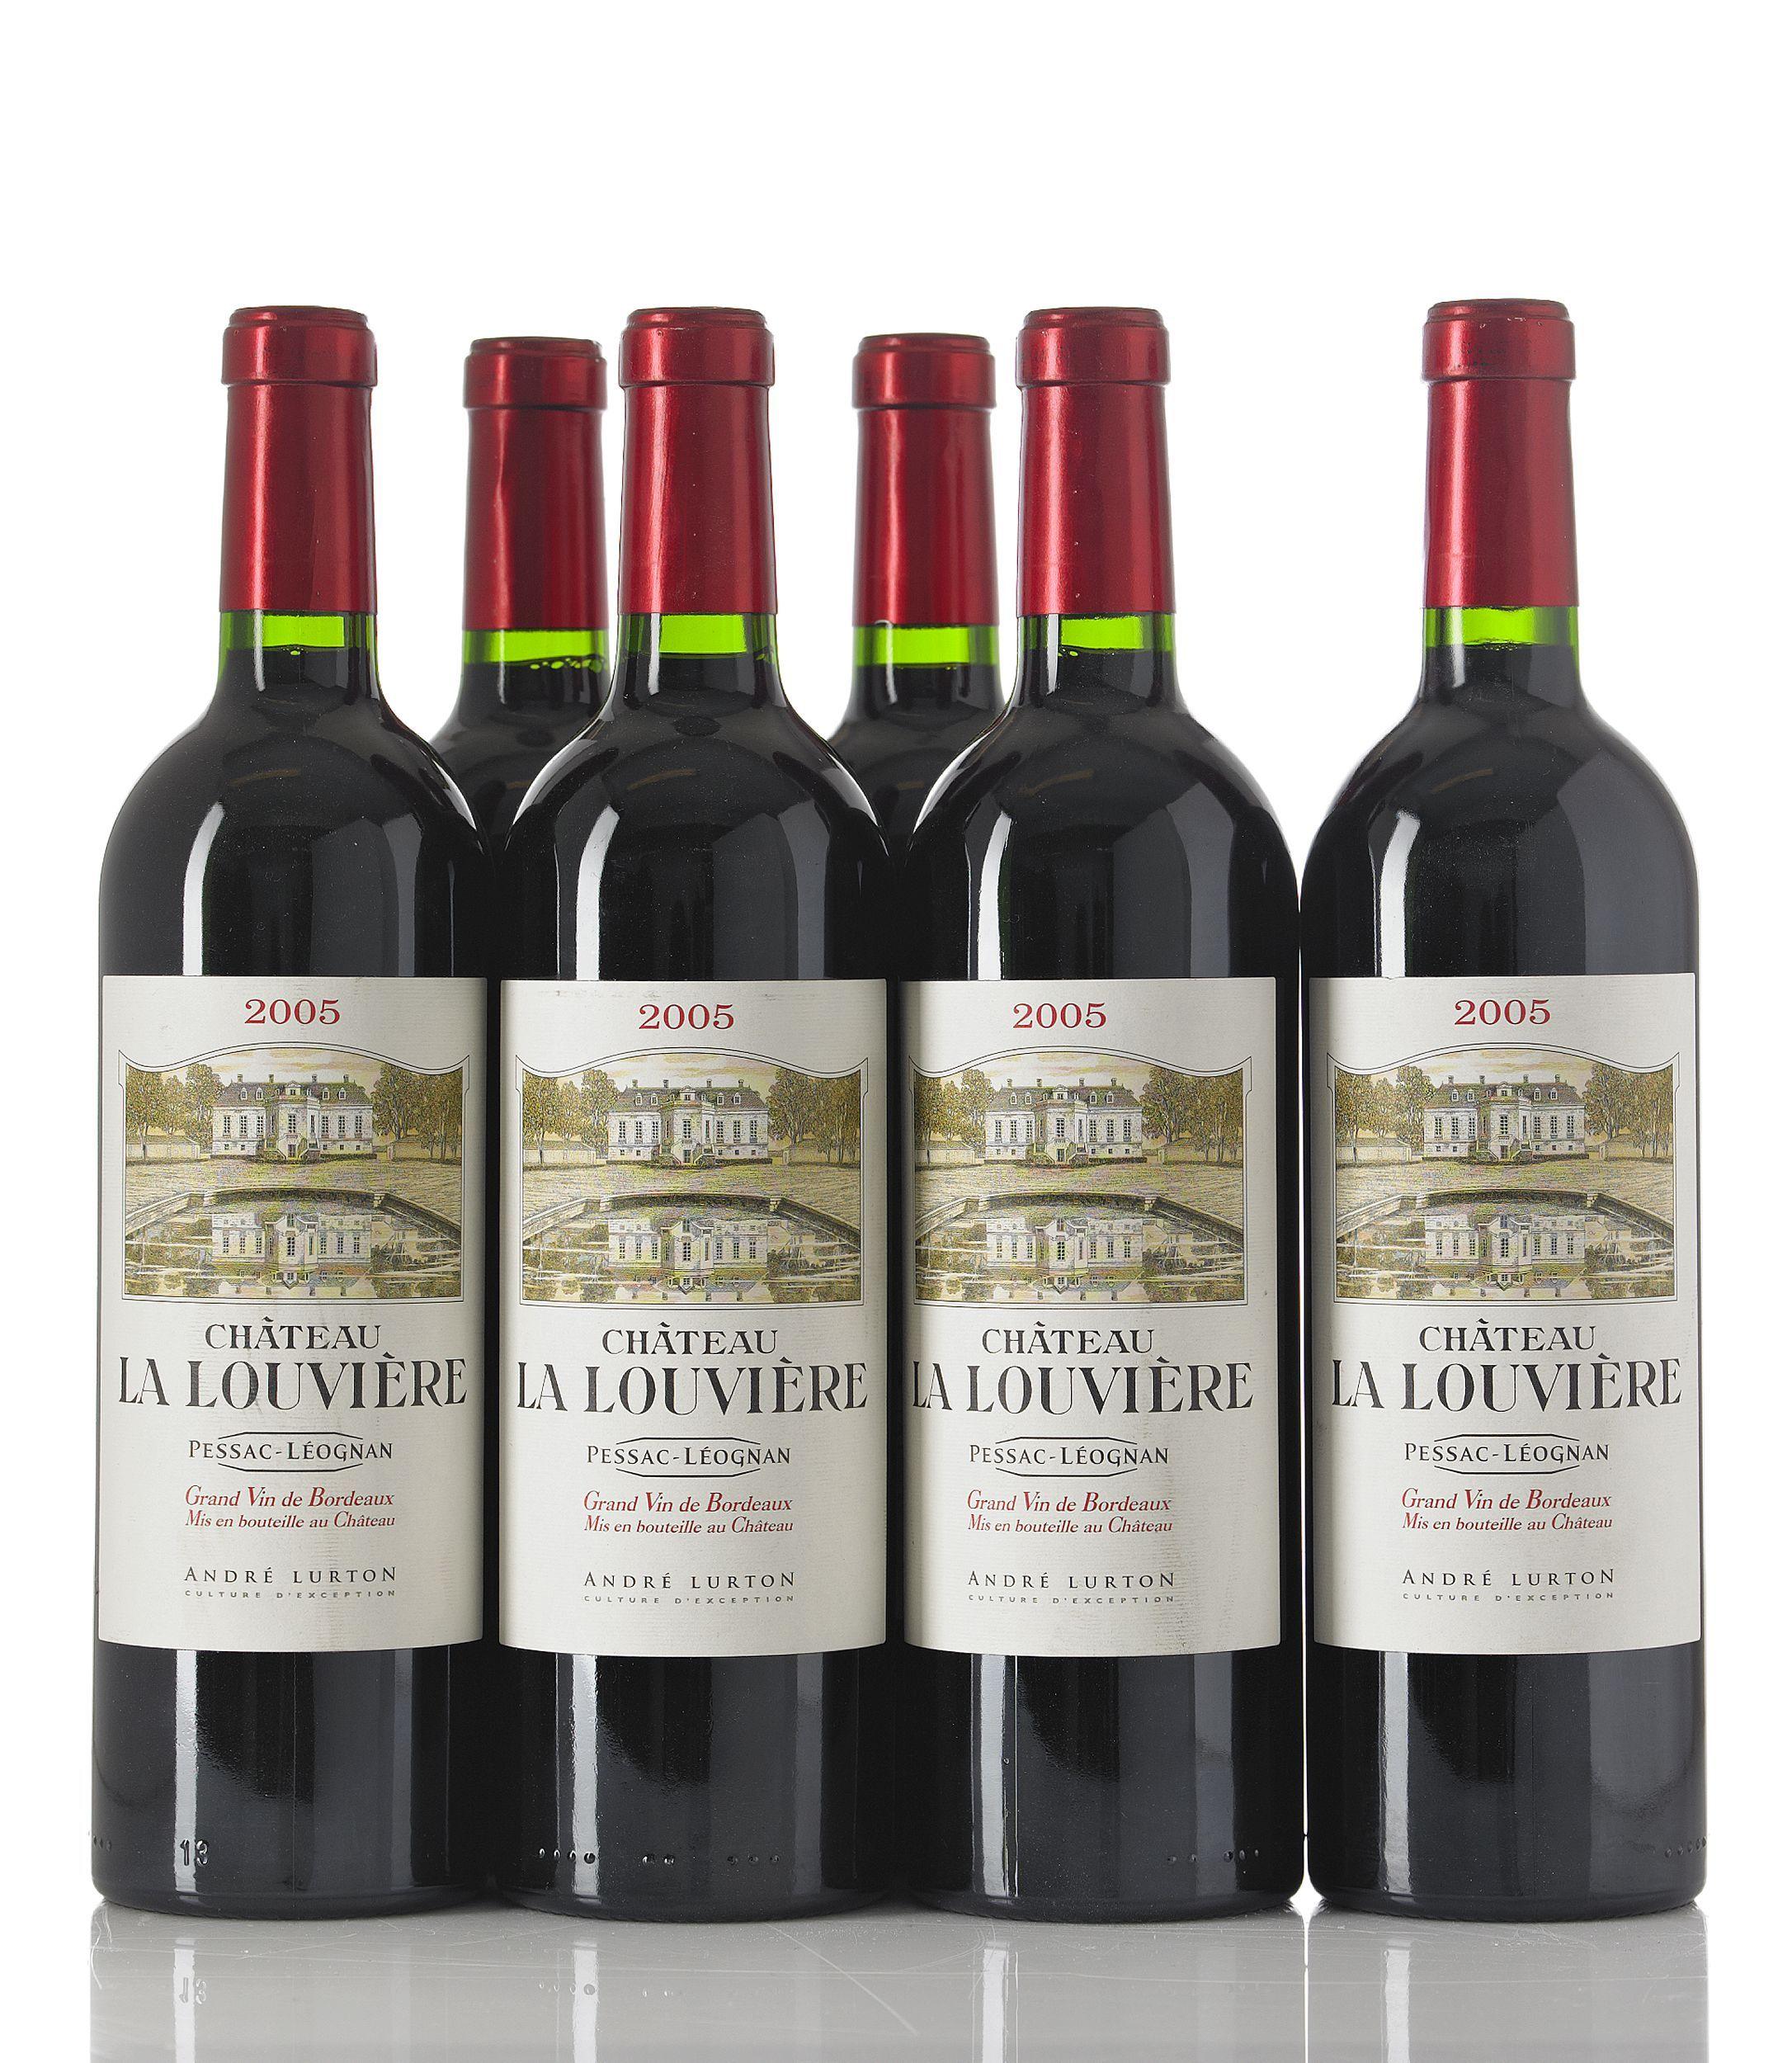 Chateau La Louviere 2005 Red Wine French Wine Wines Wine Bottle